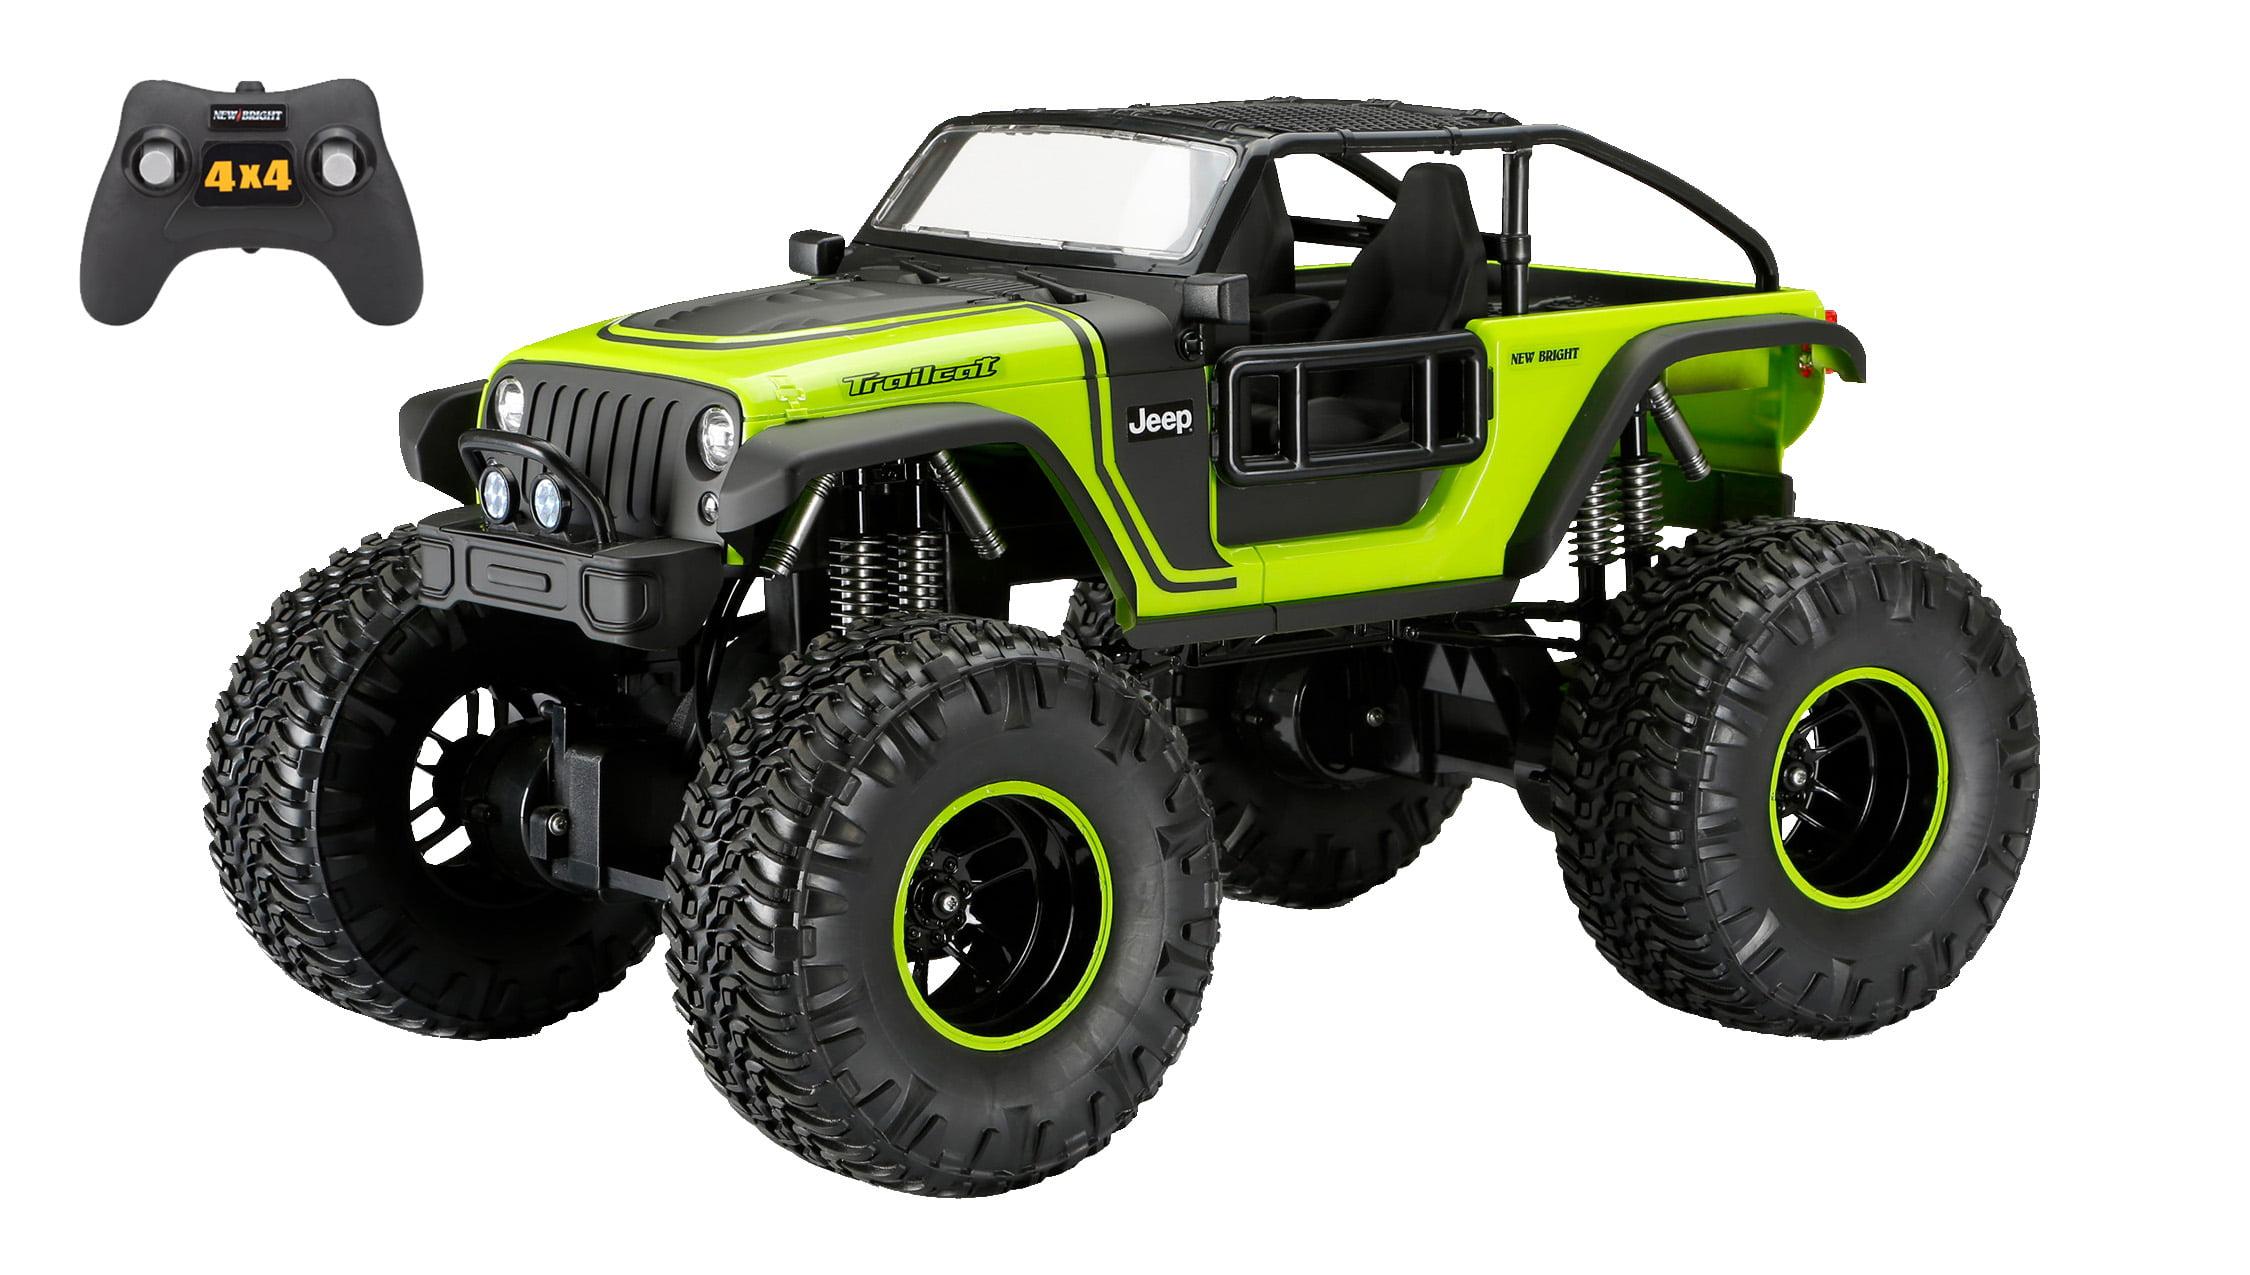 New Bright 1:8 Radio Control 4x4 Jeep Trailcat by New Bright Industrial Co., Ltd.